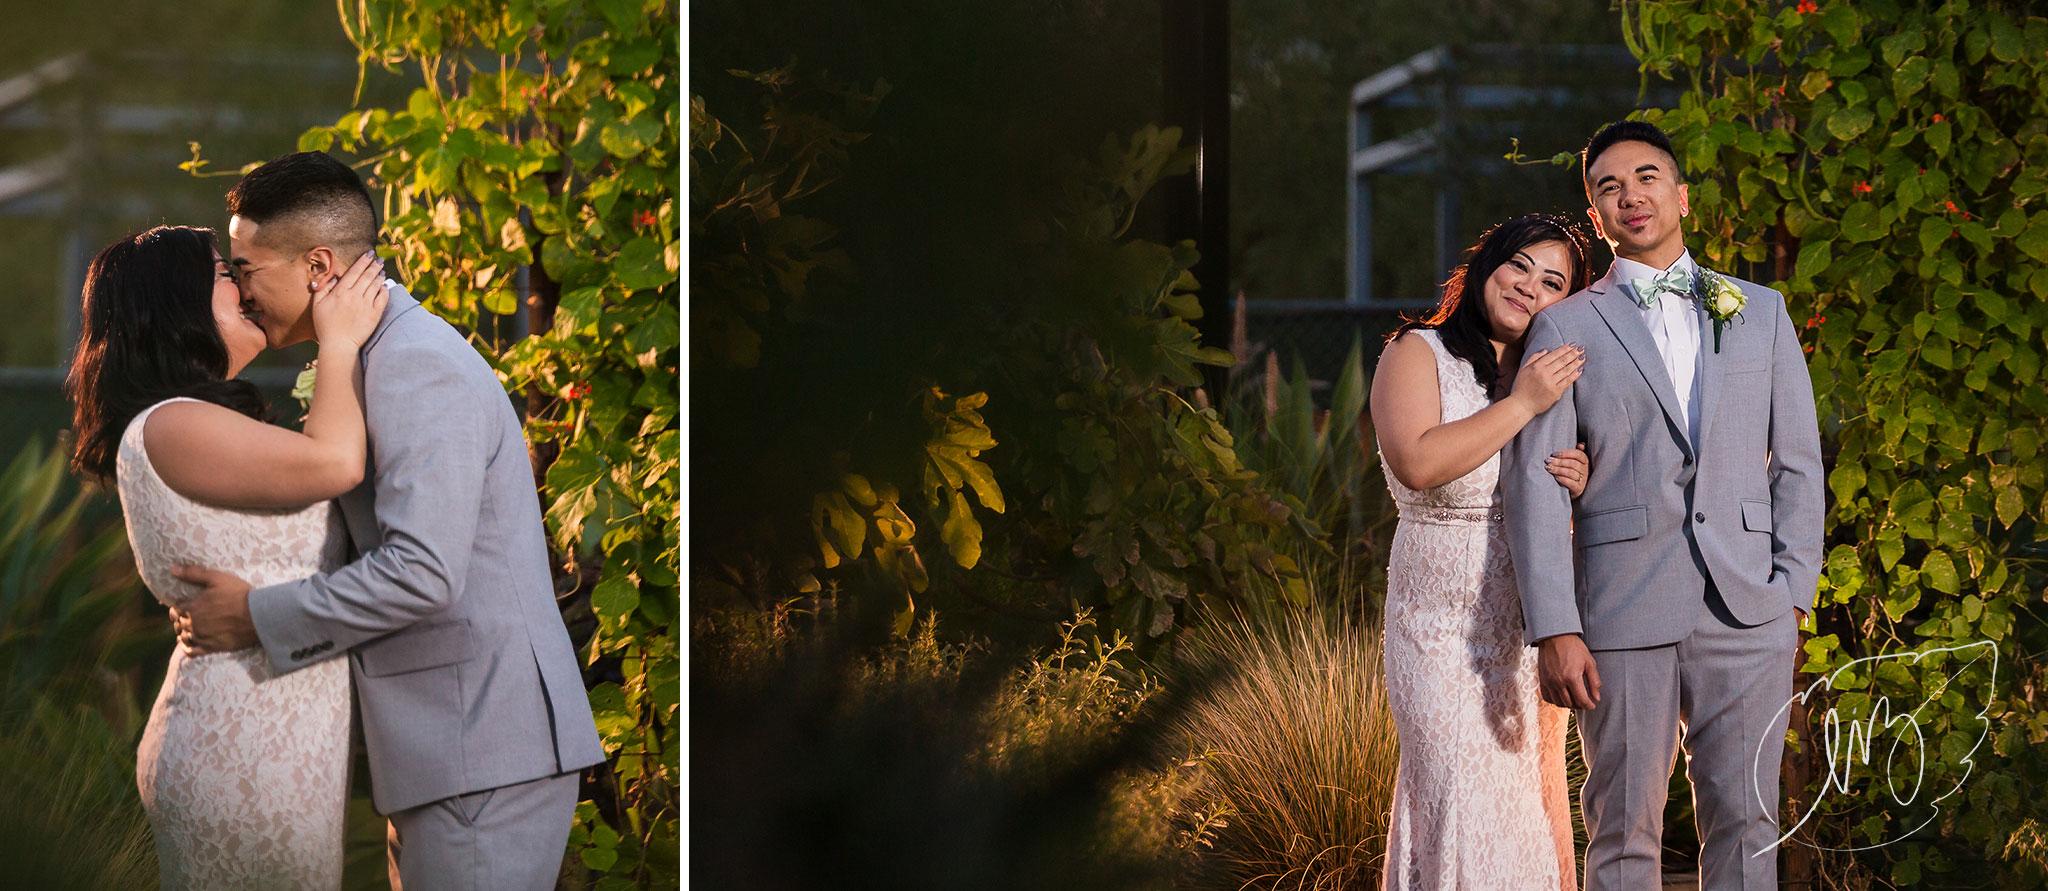 California_Orange_County_Wedding_Photographer_48.jpg